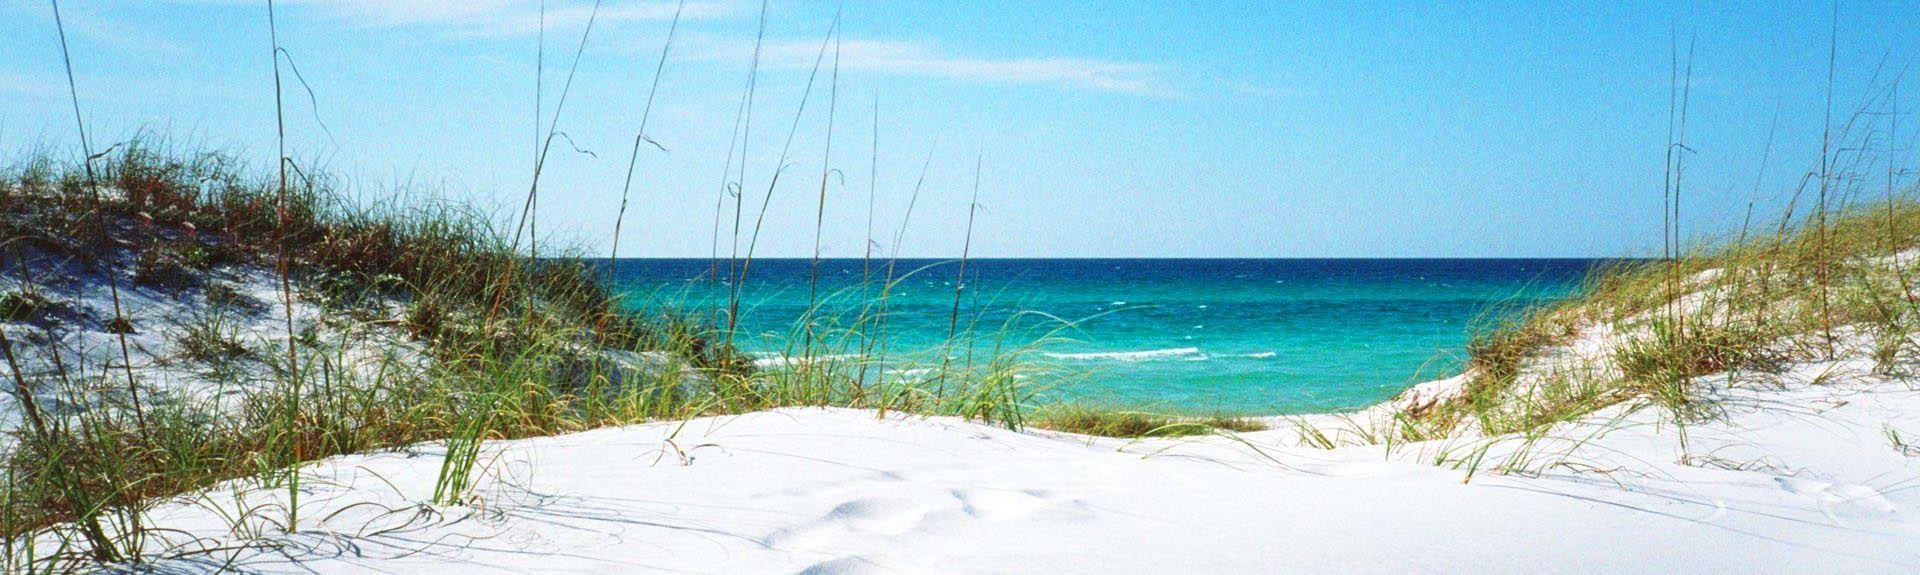 Islander Beach Resort (Okaloosa Island, Florida, United States)